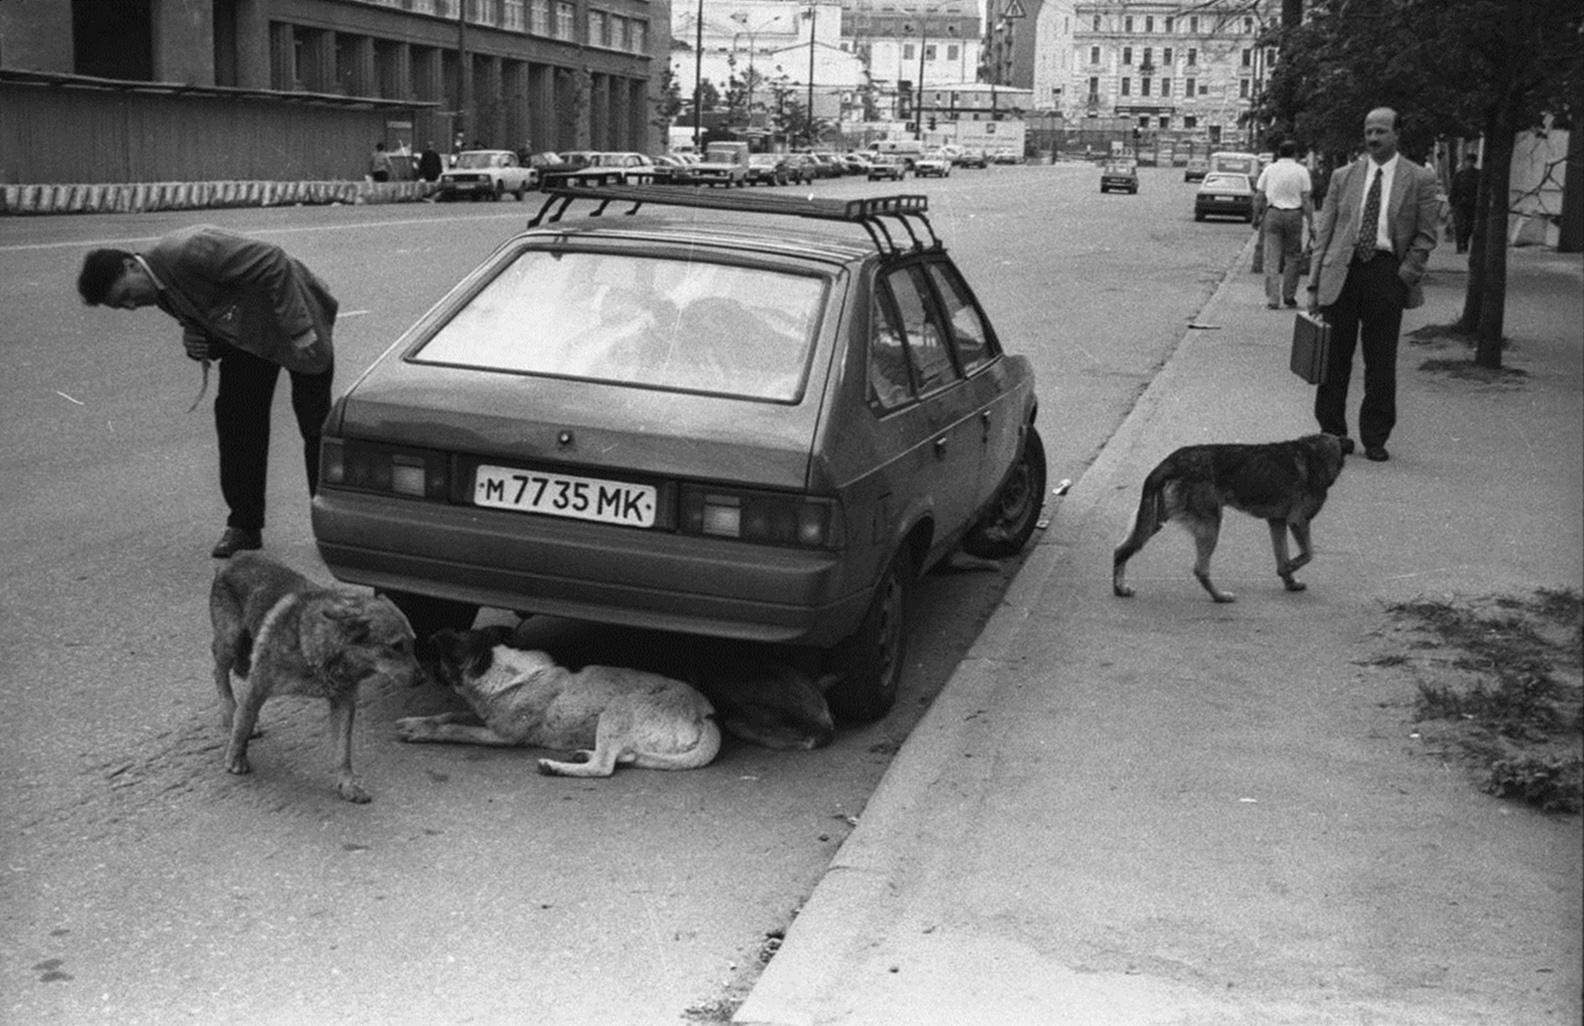 1993. Проспект Академика Сахарова